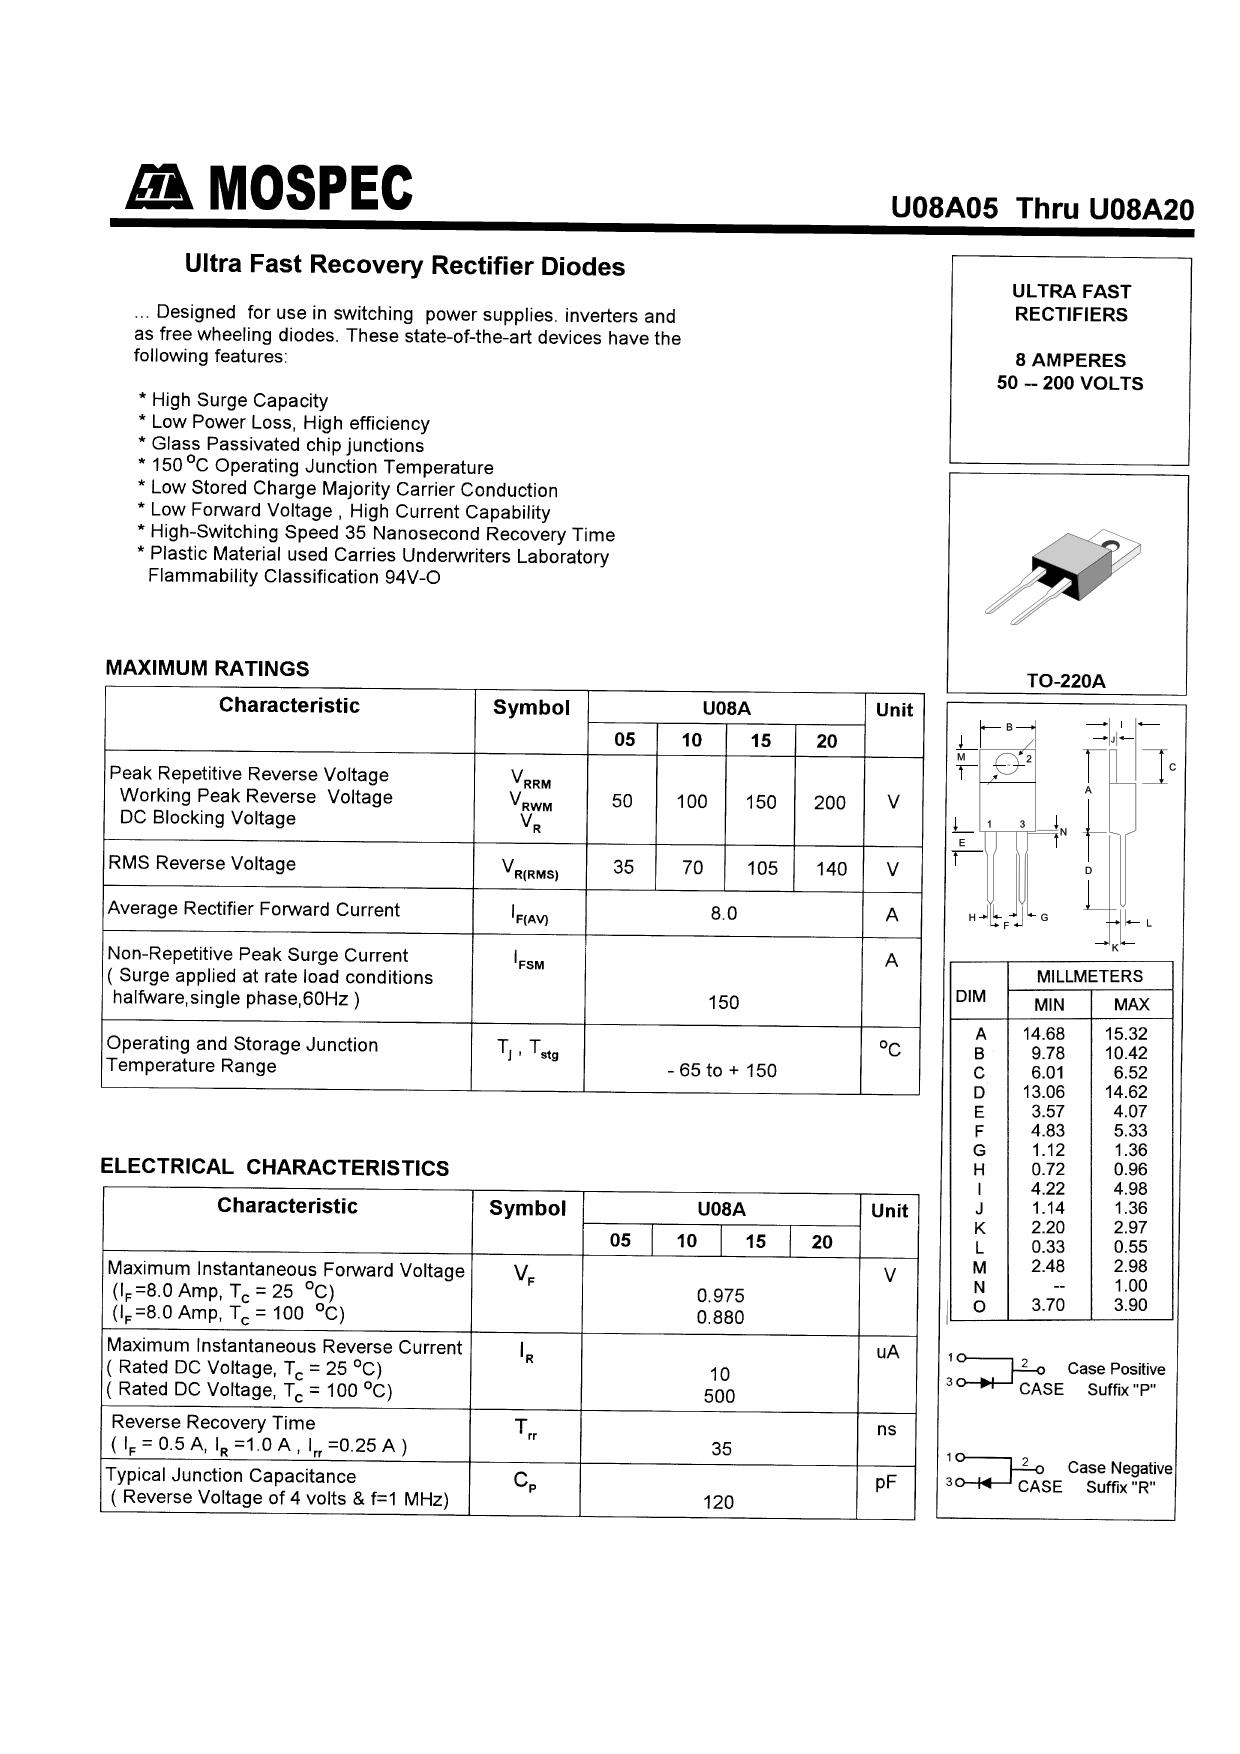 U08A20 даташит PDF